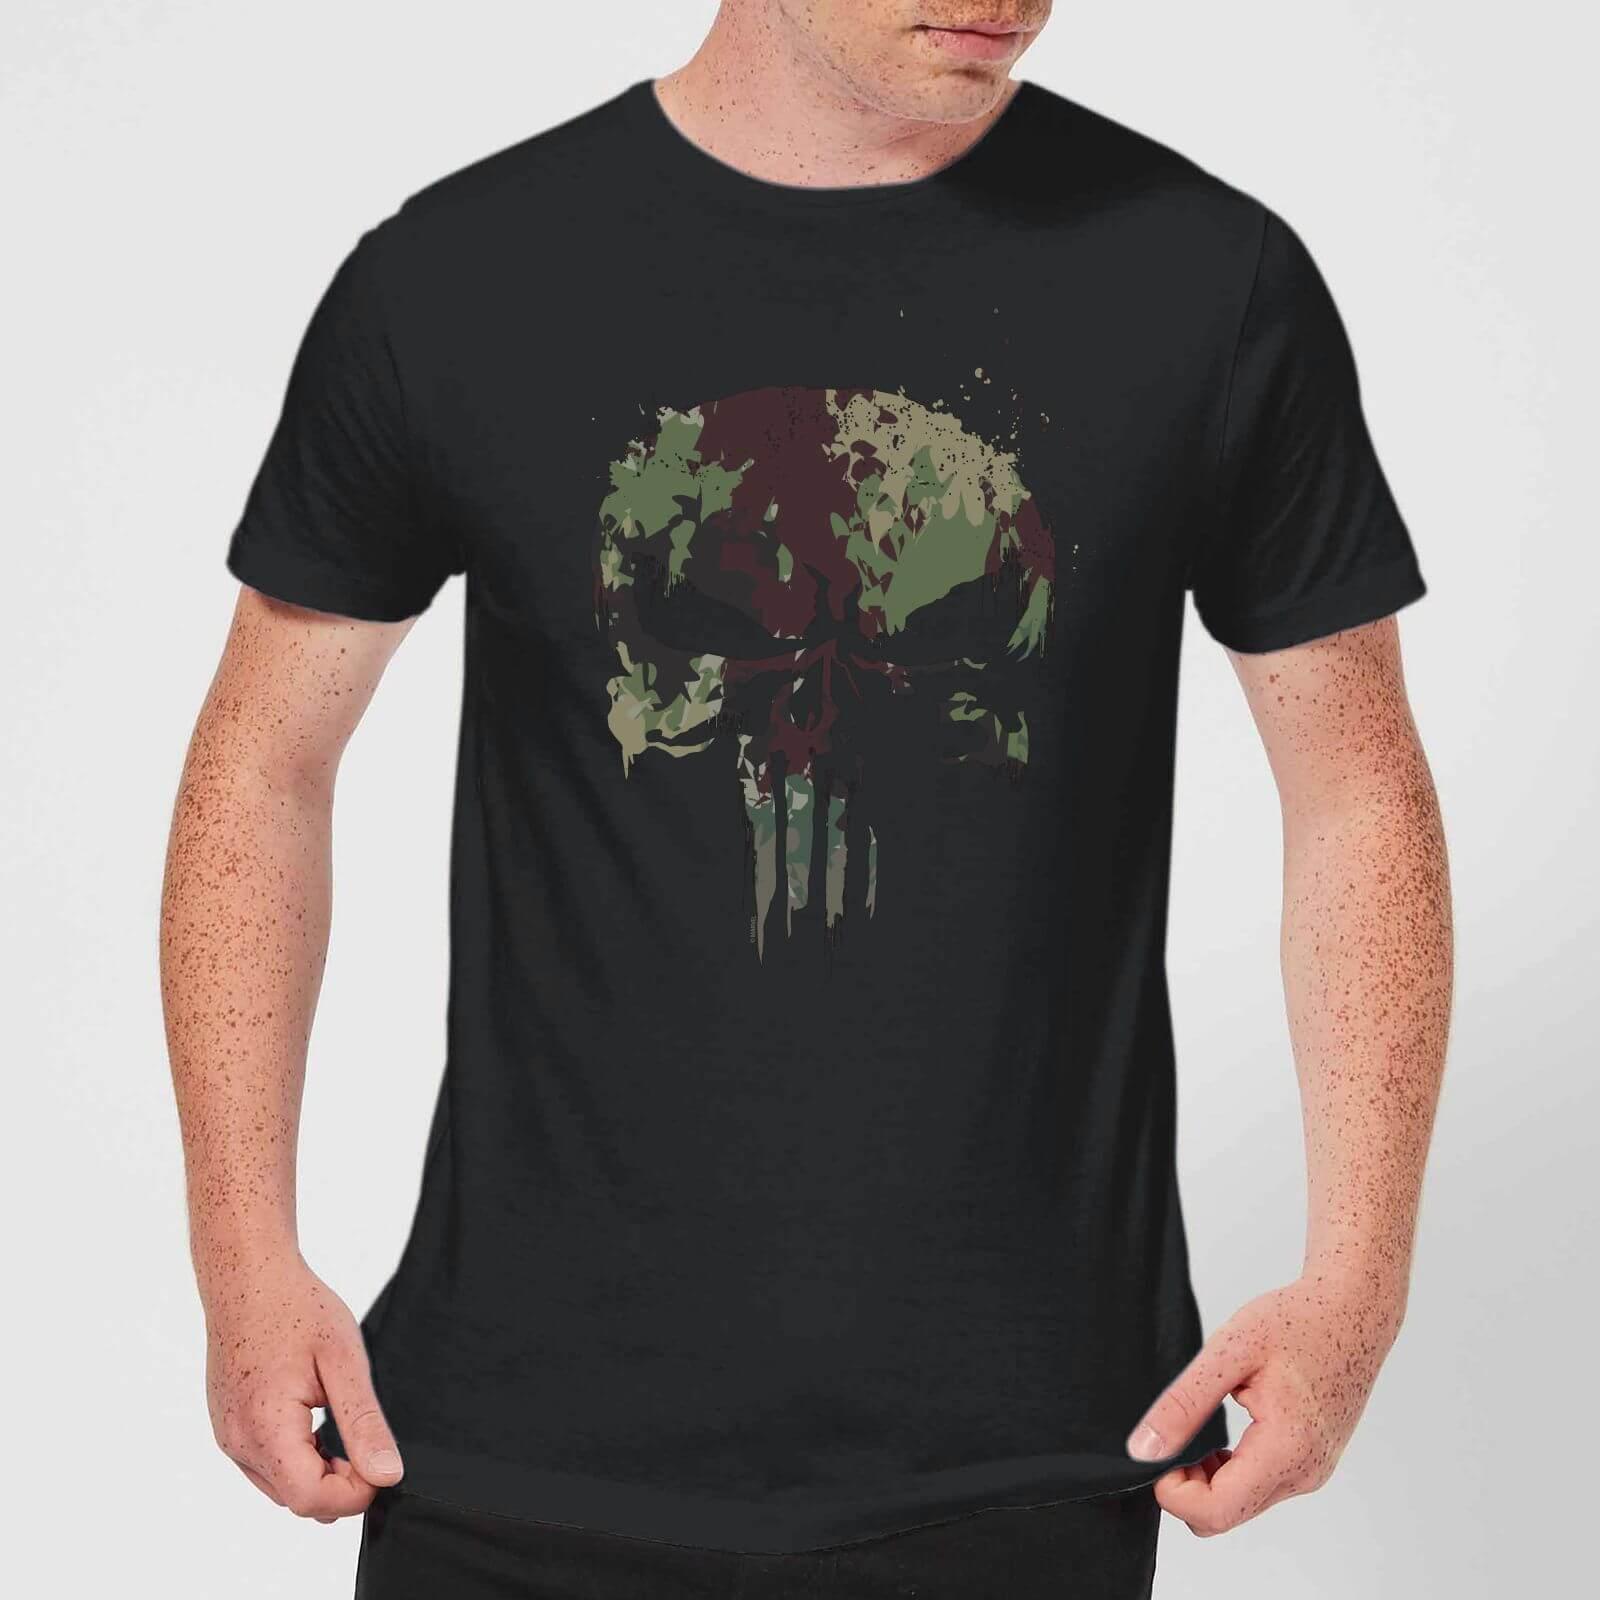 Marvel Camo Skull - Herren & Damen T-Shirt für 10,99€ inkl. Versand (Zavvi.de)